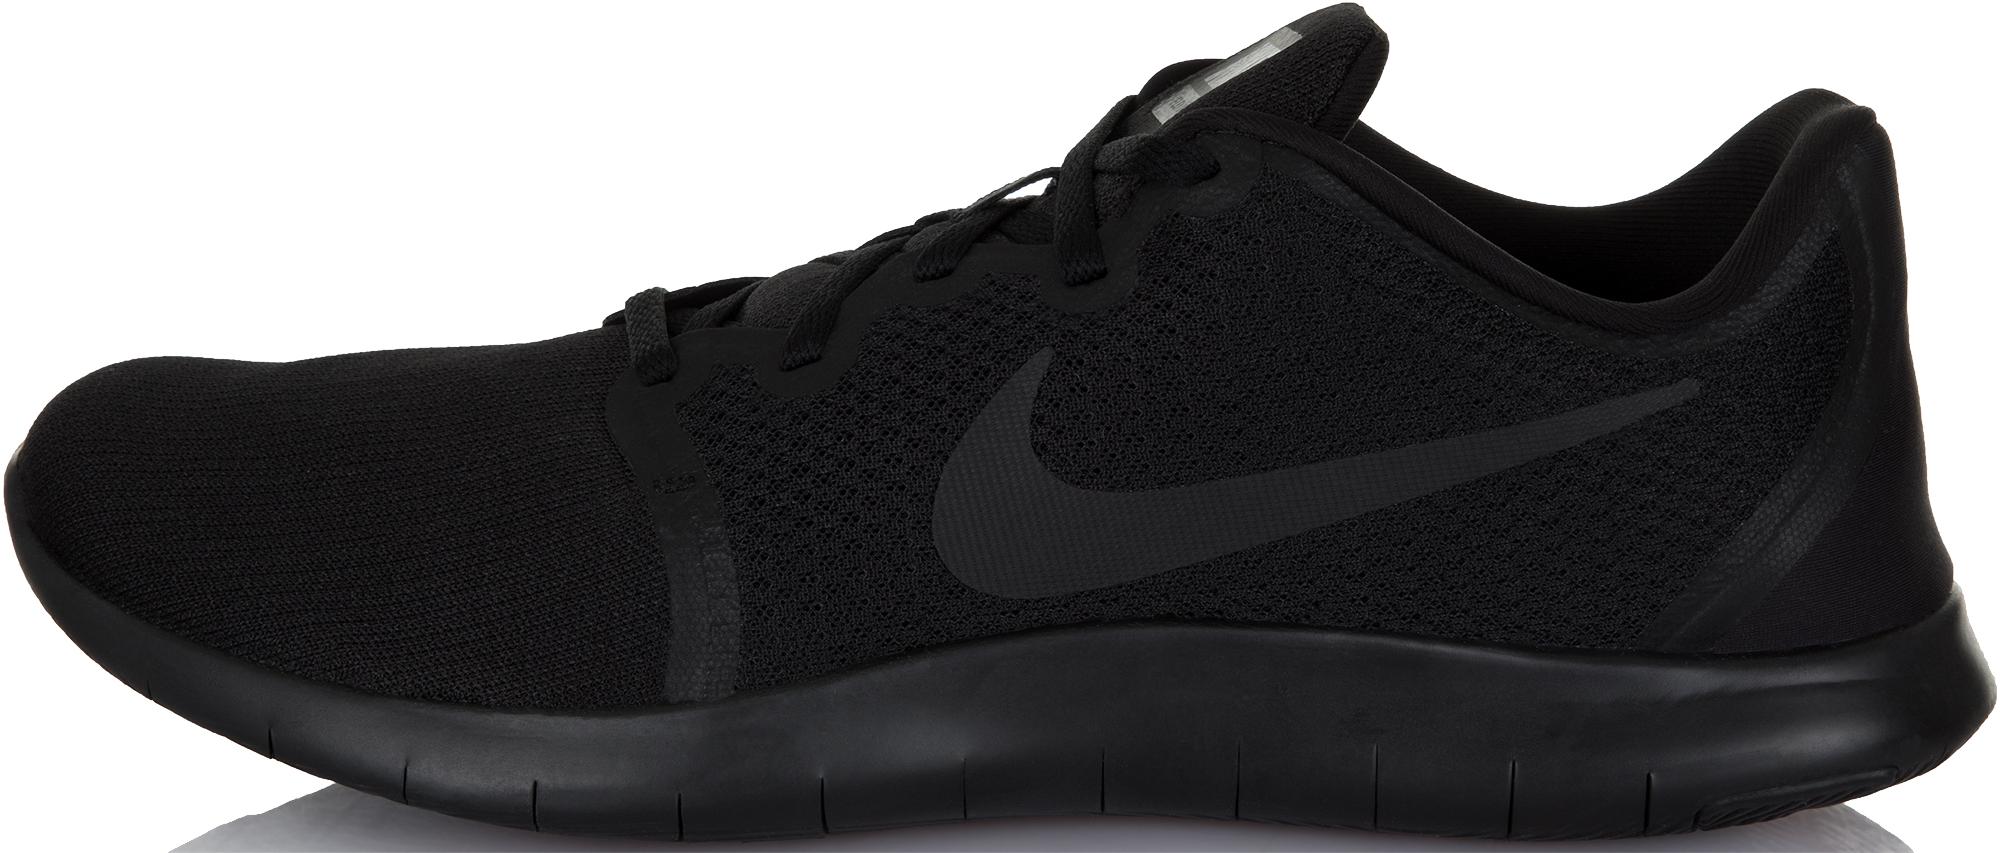 Nike Кроссовки мужские Nike Flex Contact 2, размер 41,5